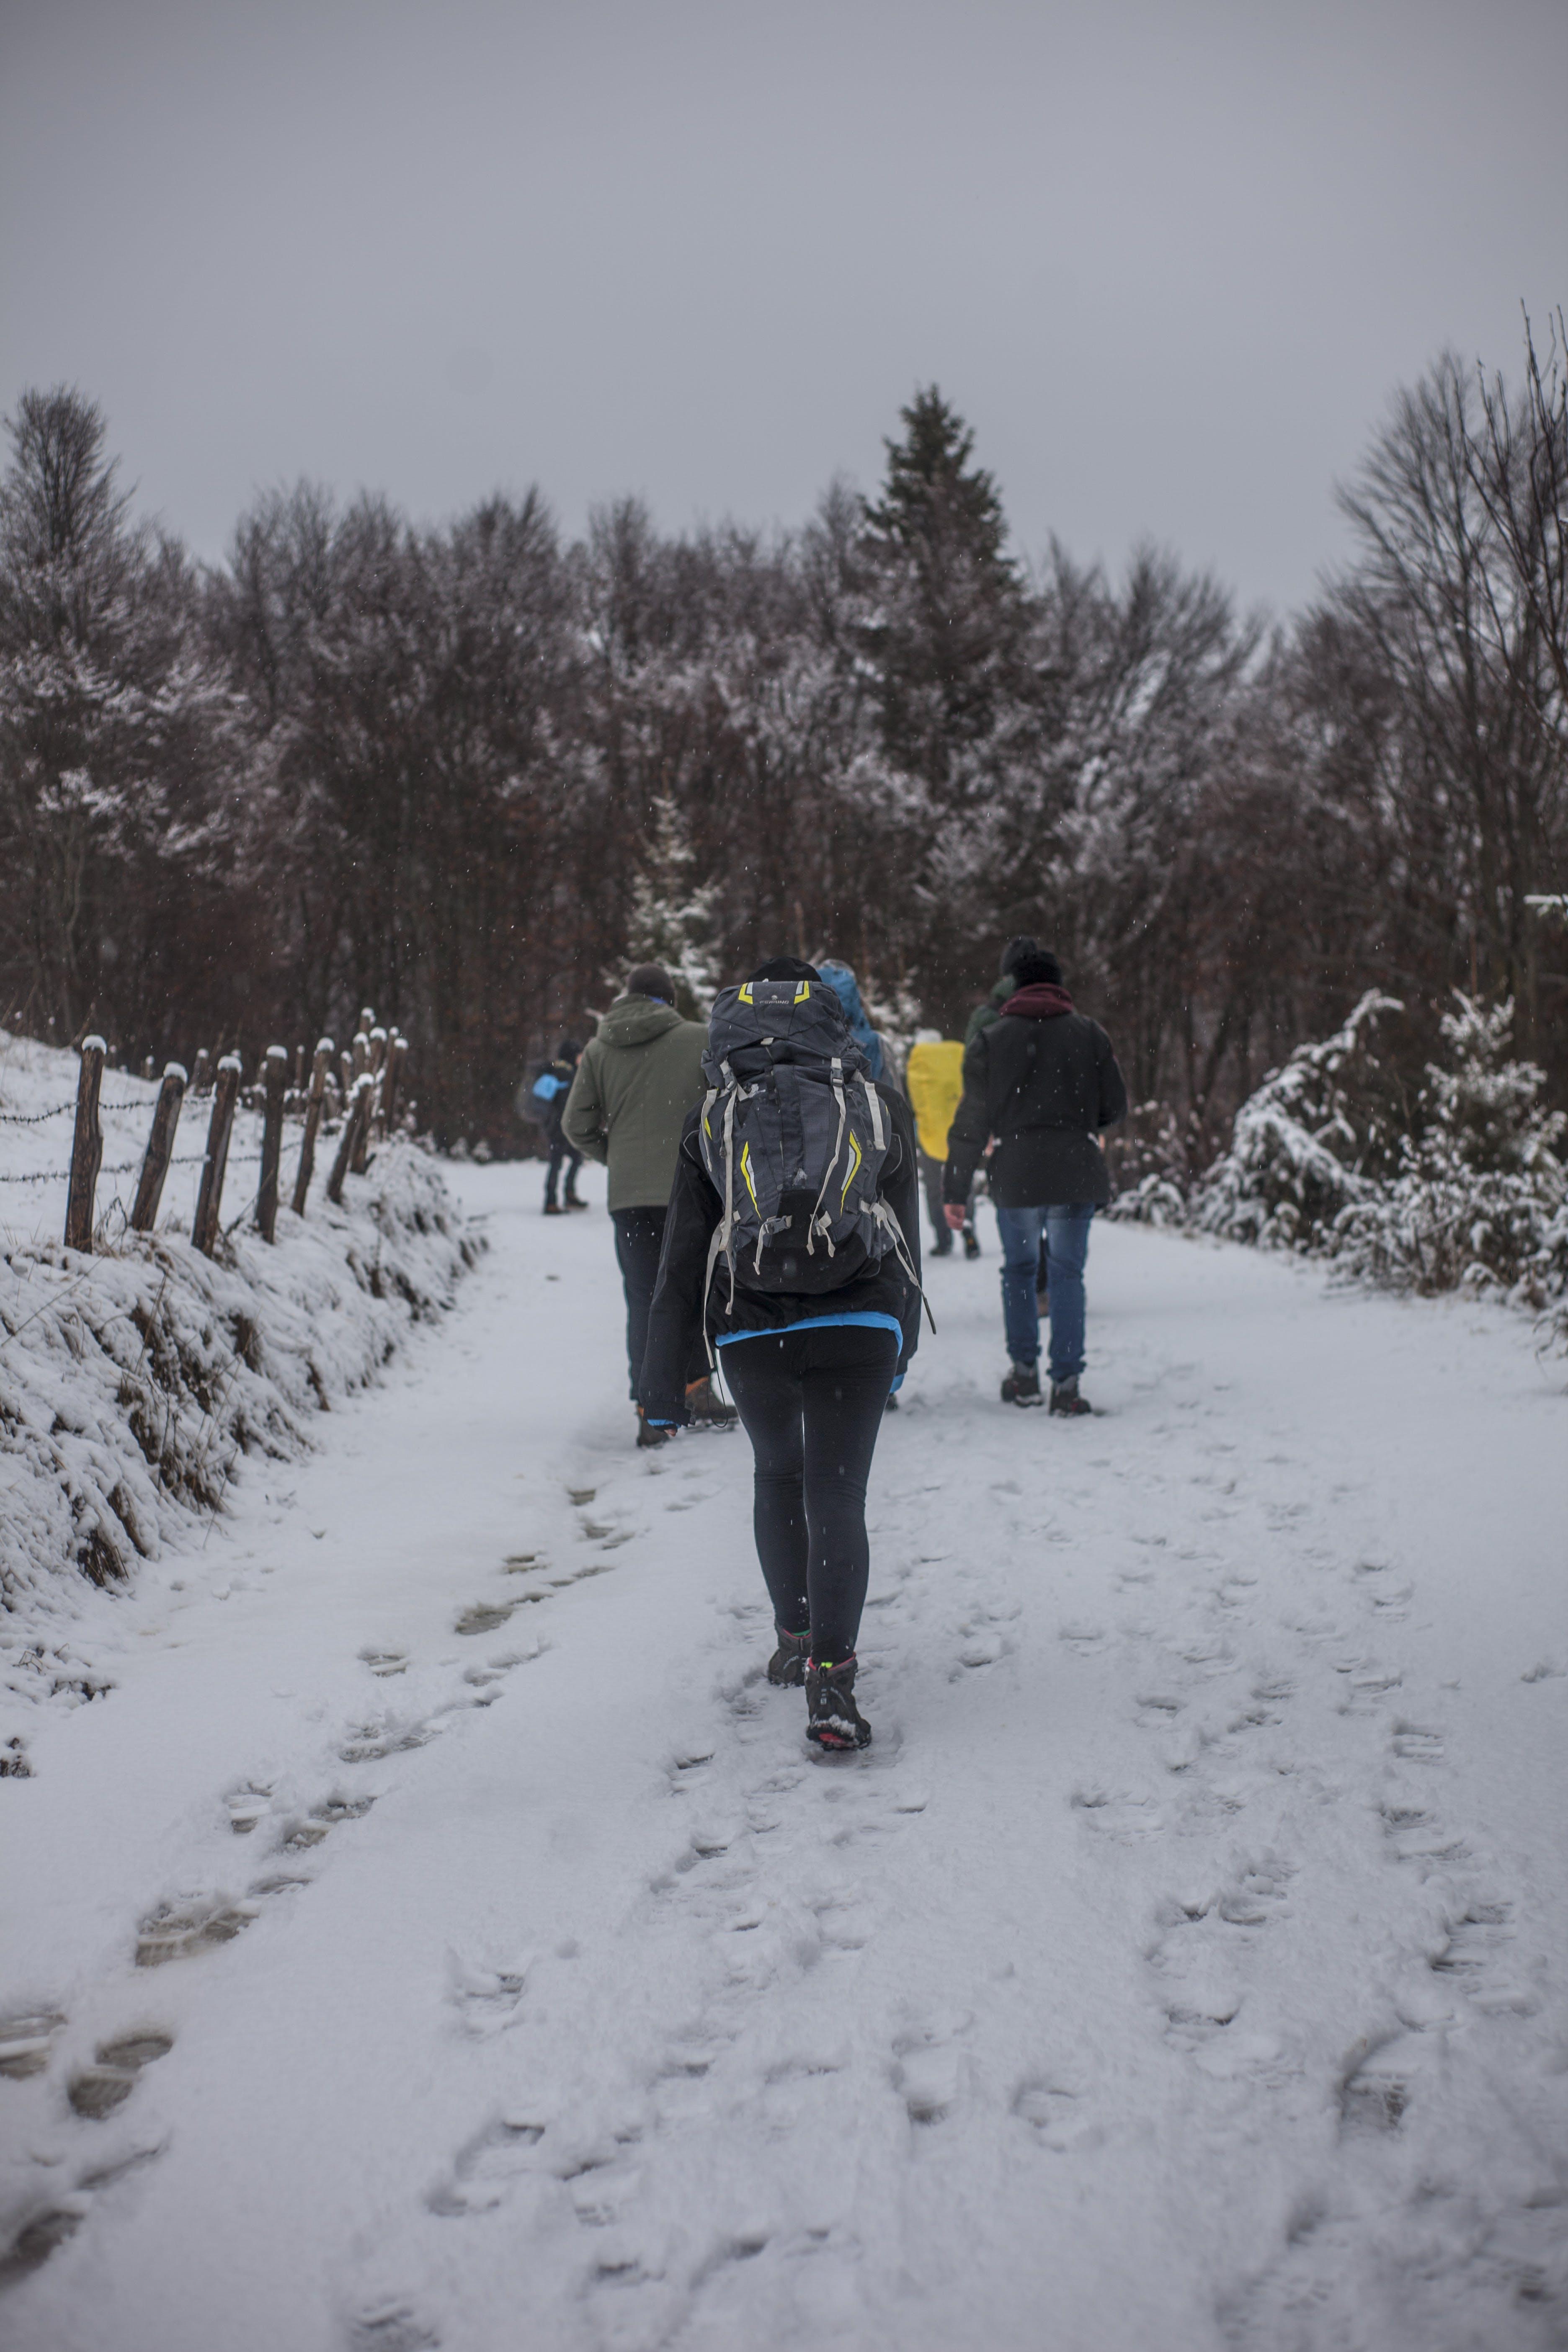 People Walking on Snowy Road during Winter